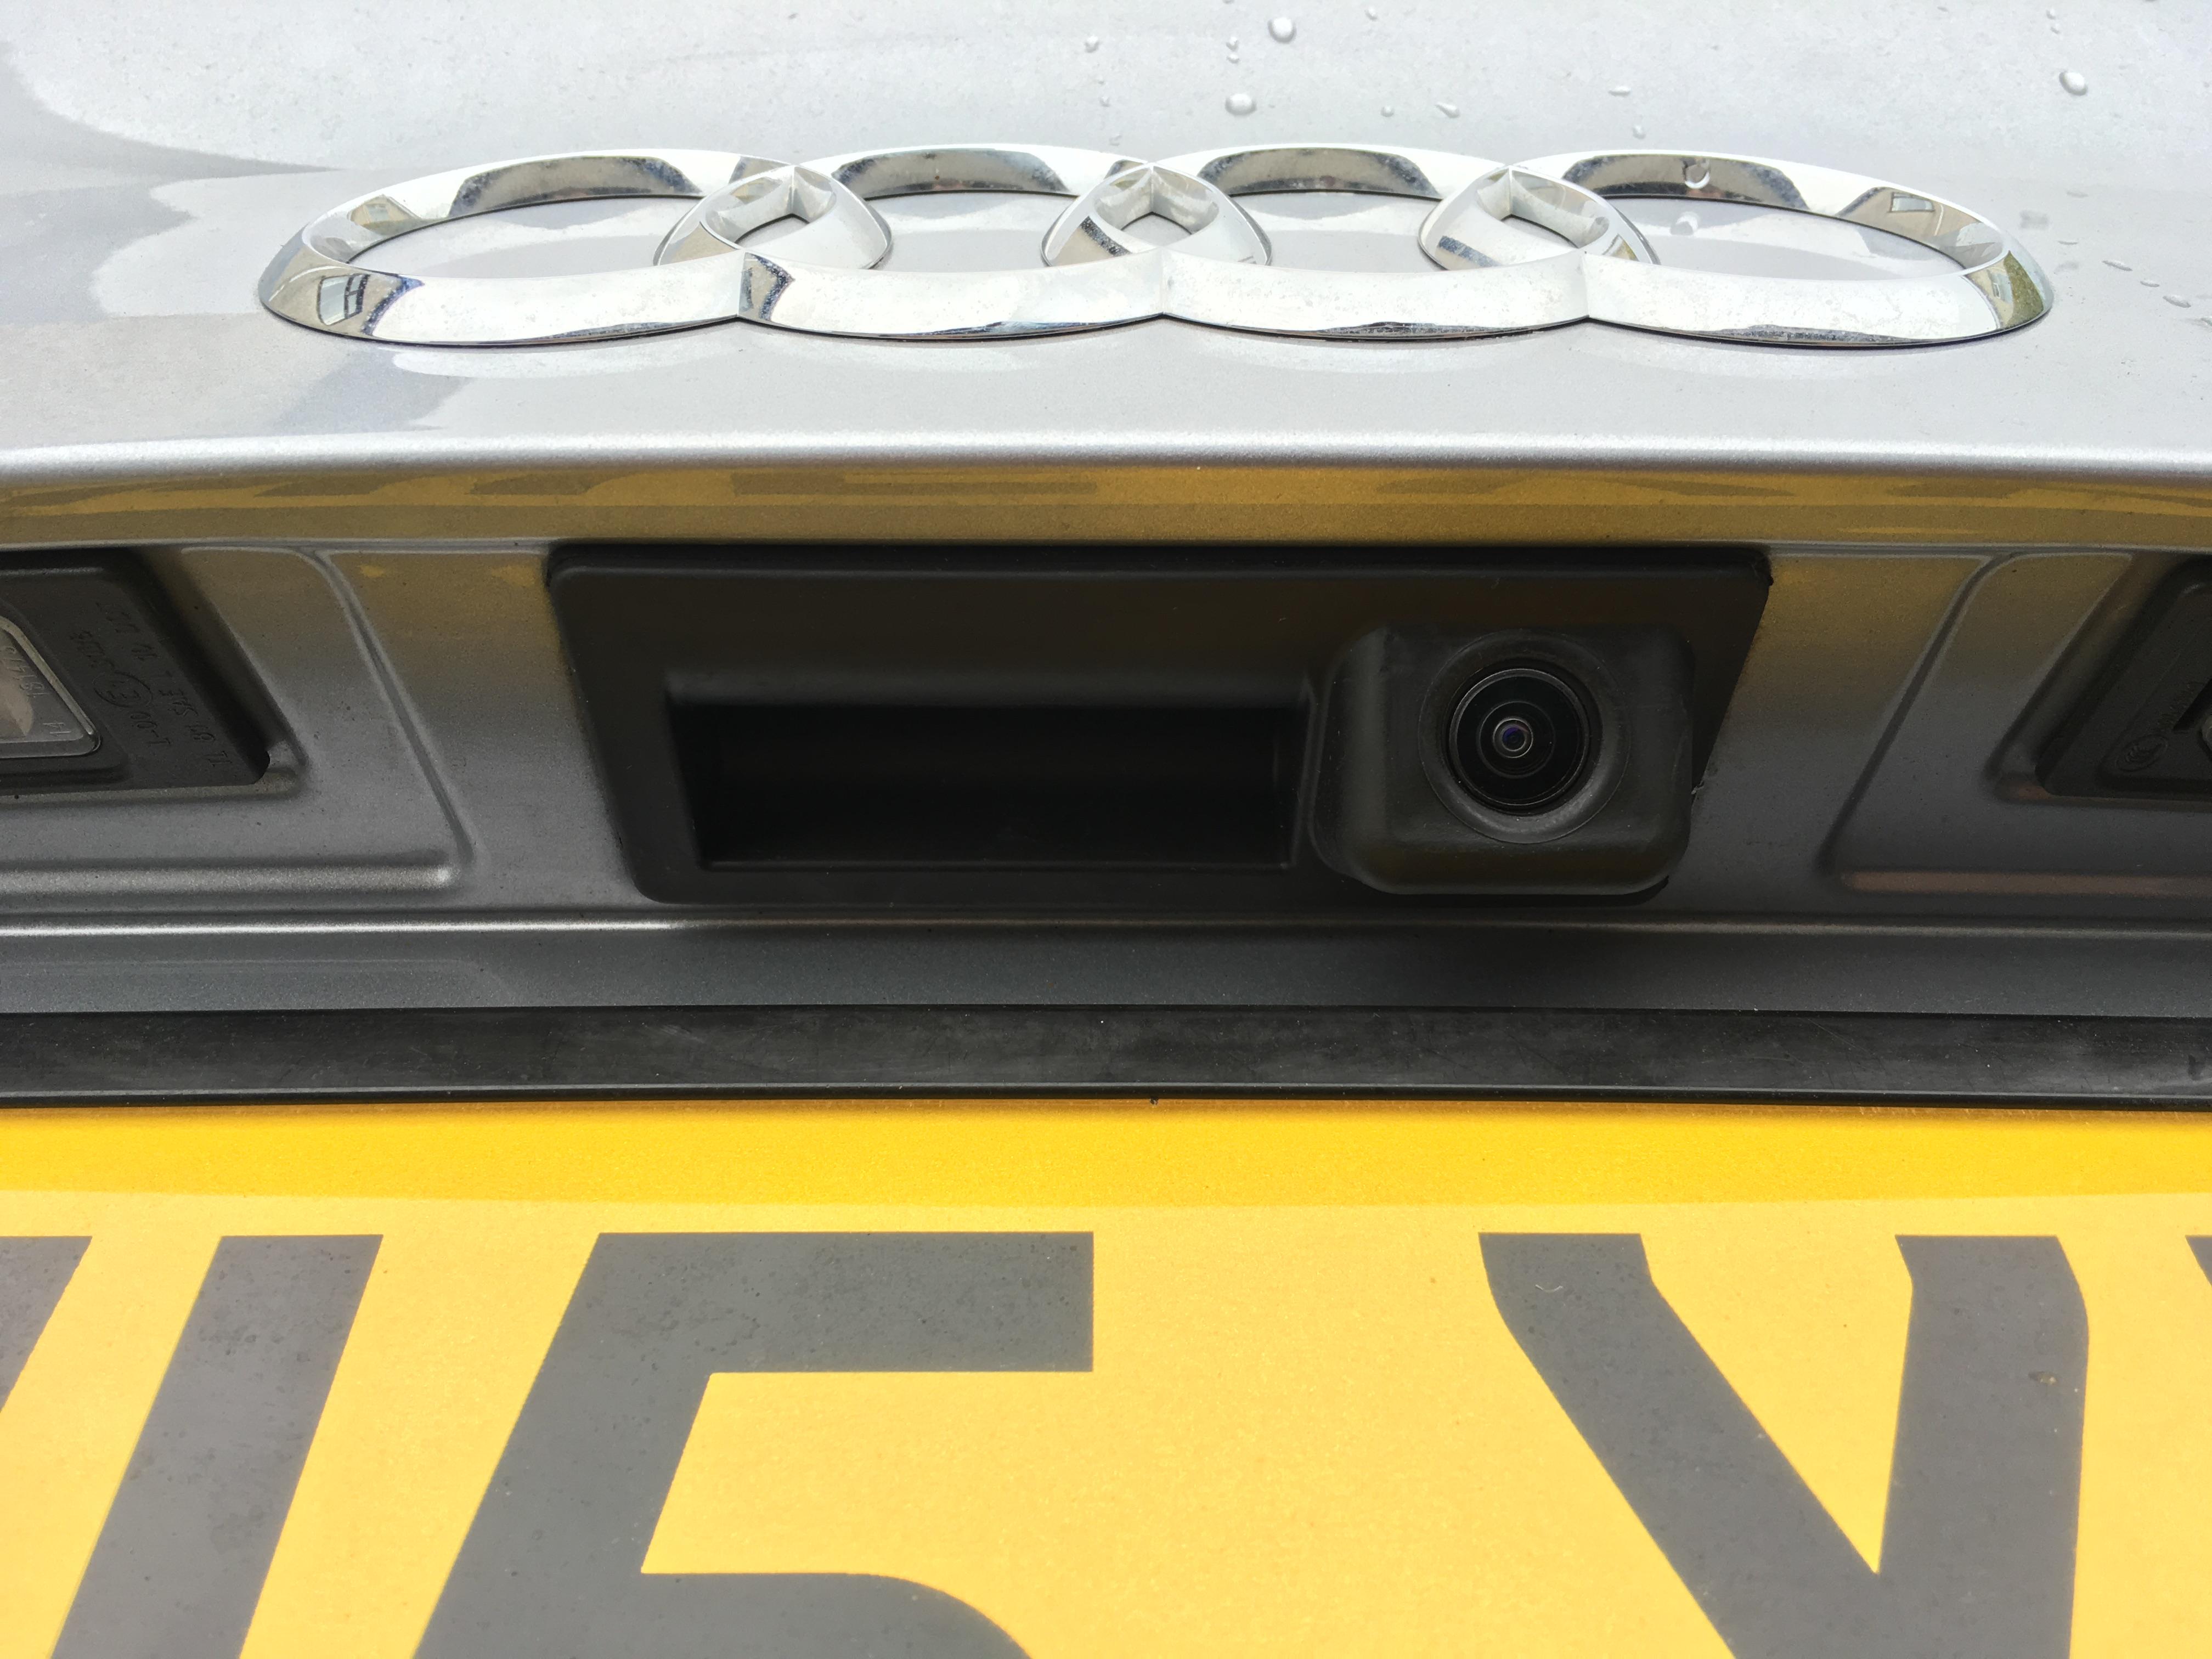 Sq5 Retrofit Reversing Camera Backup Wiring Diagram For Audi Q5 2016 Img